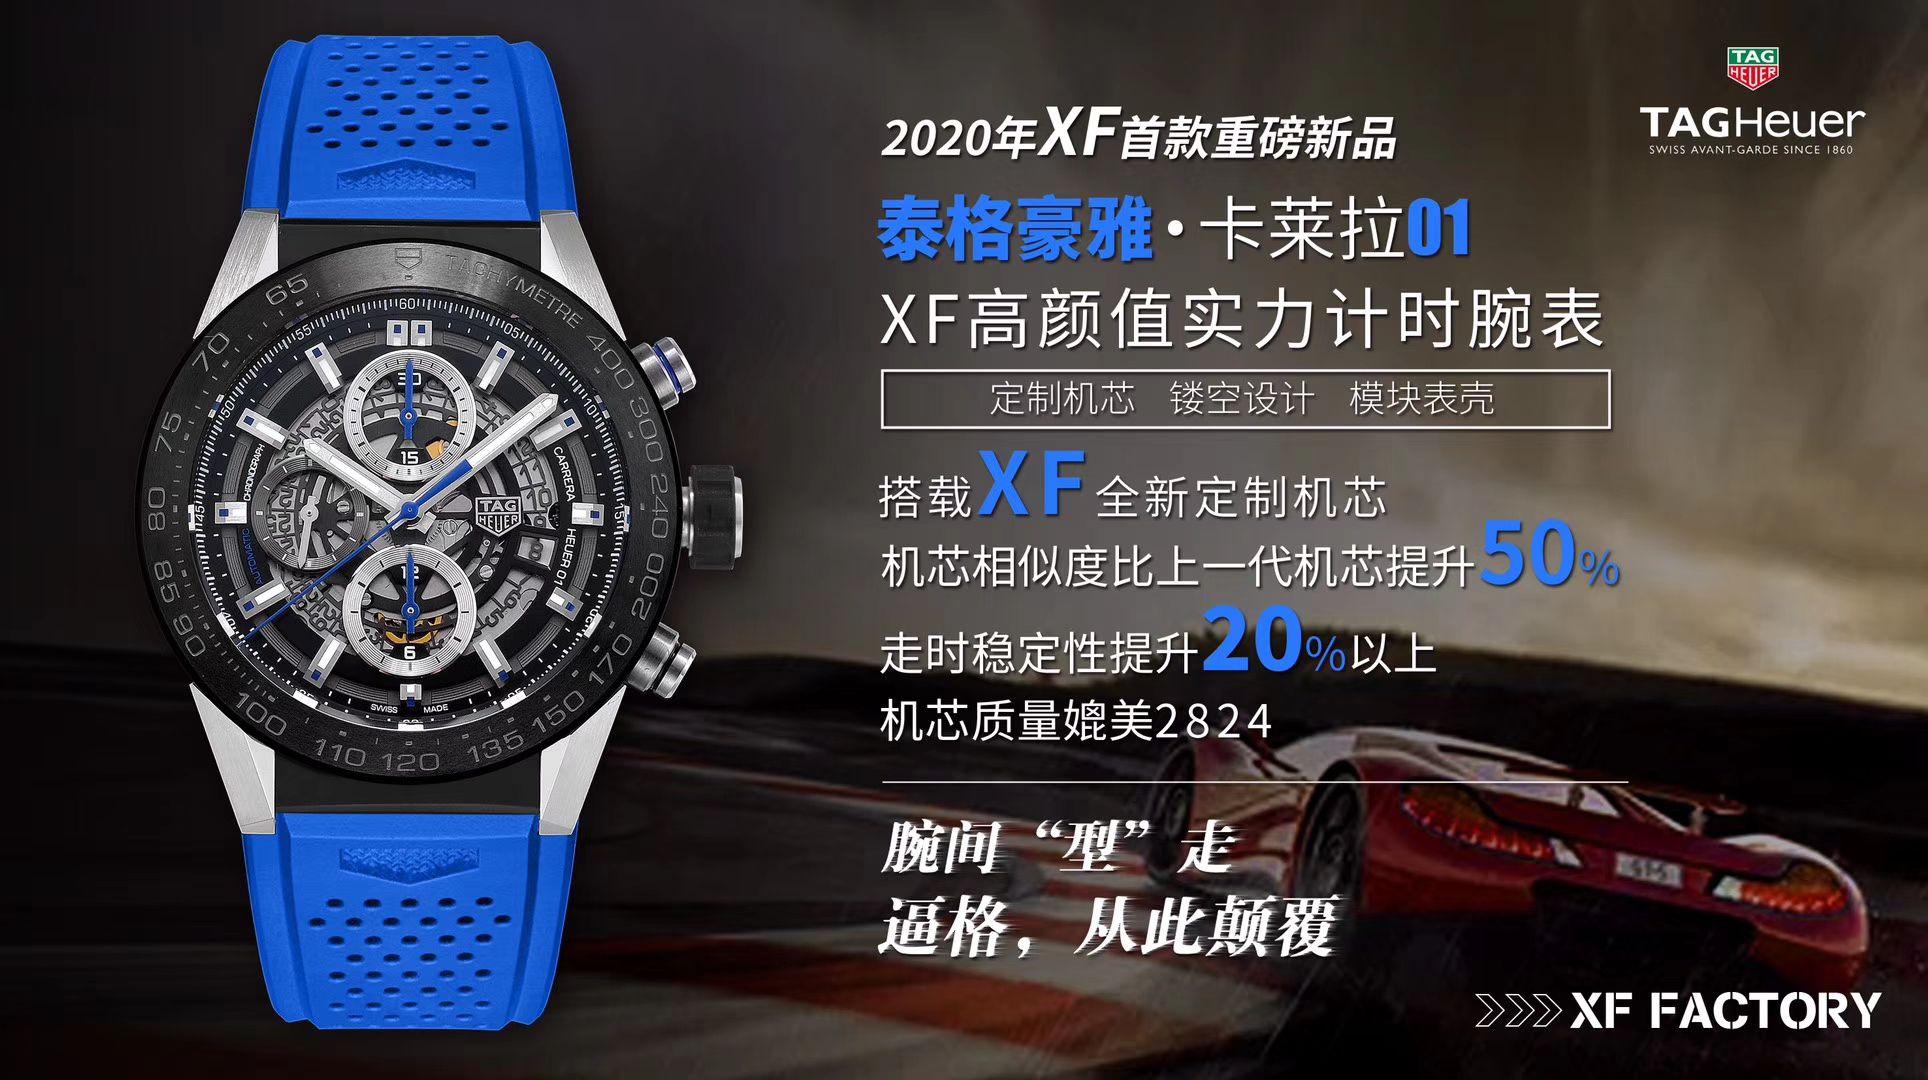 XF厂顶级复刻手表泰格豪雅卡莱拉系列CAR2A1Z.FT6044腕表 / TG091